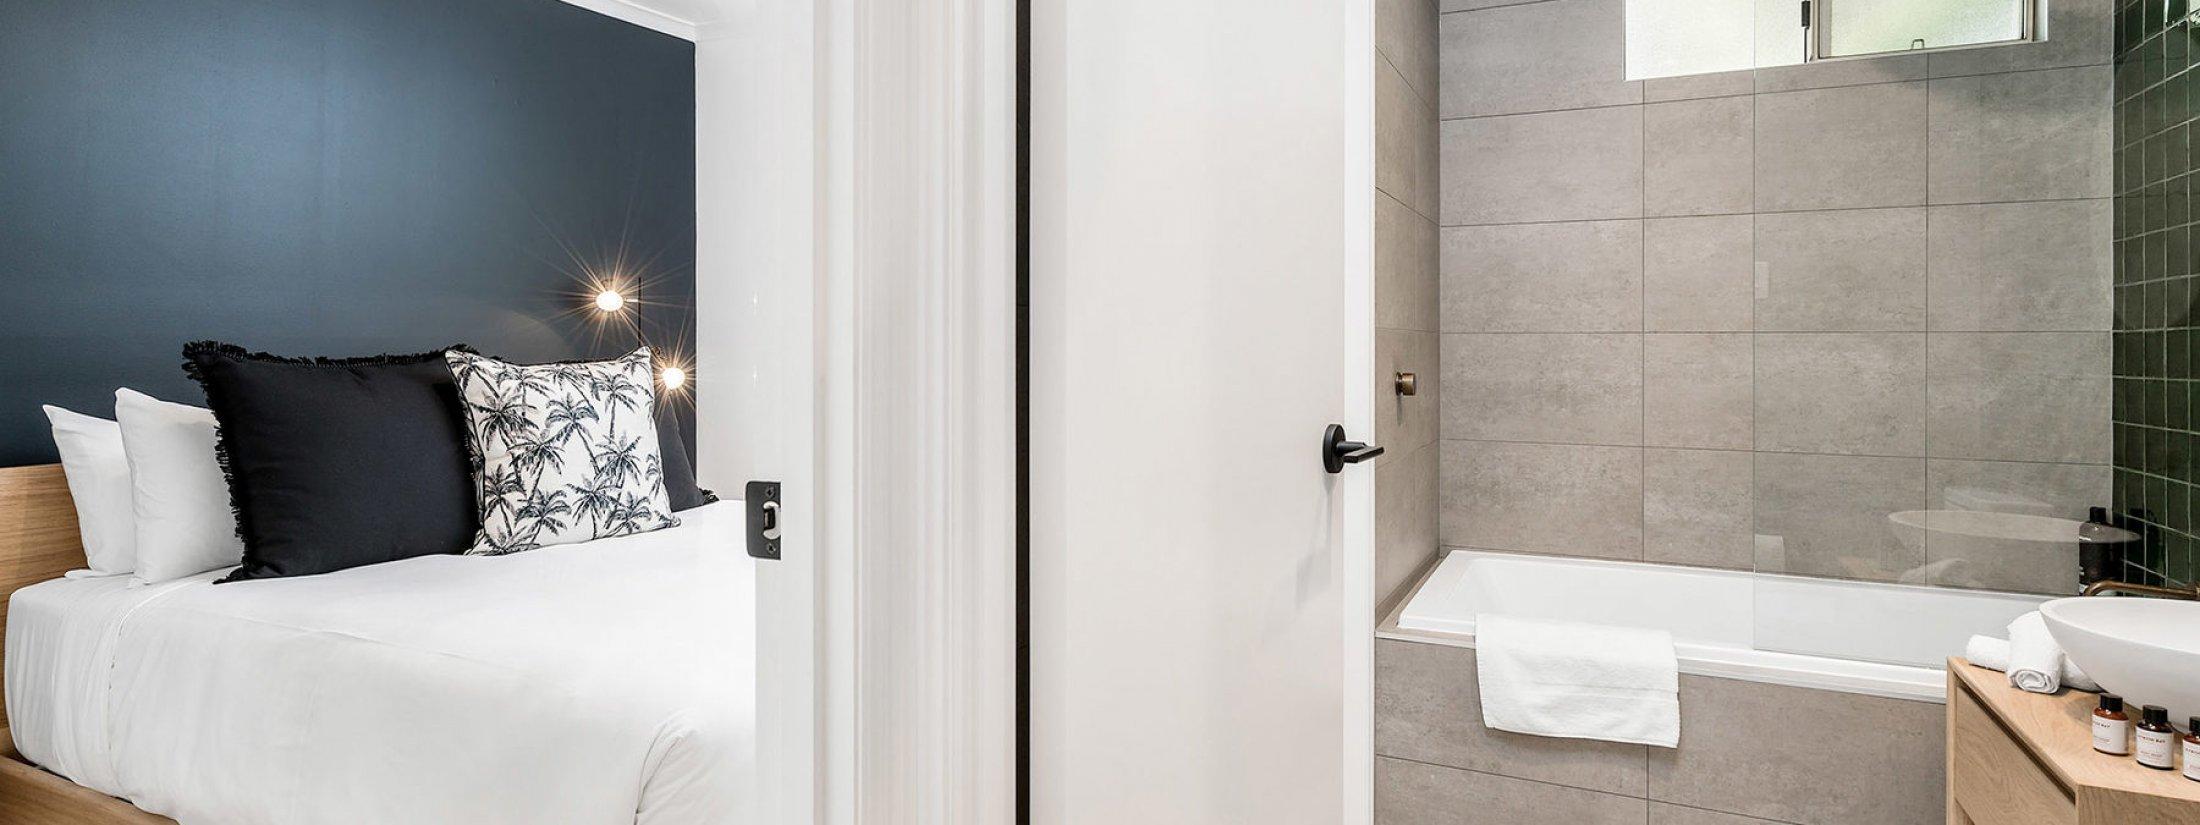 Three Salty Sisters - Byron Bay - Master Bedroom and 2 Way Bathrooms